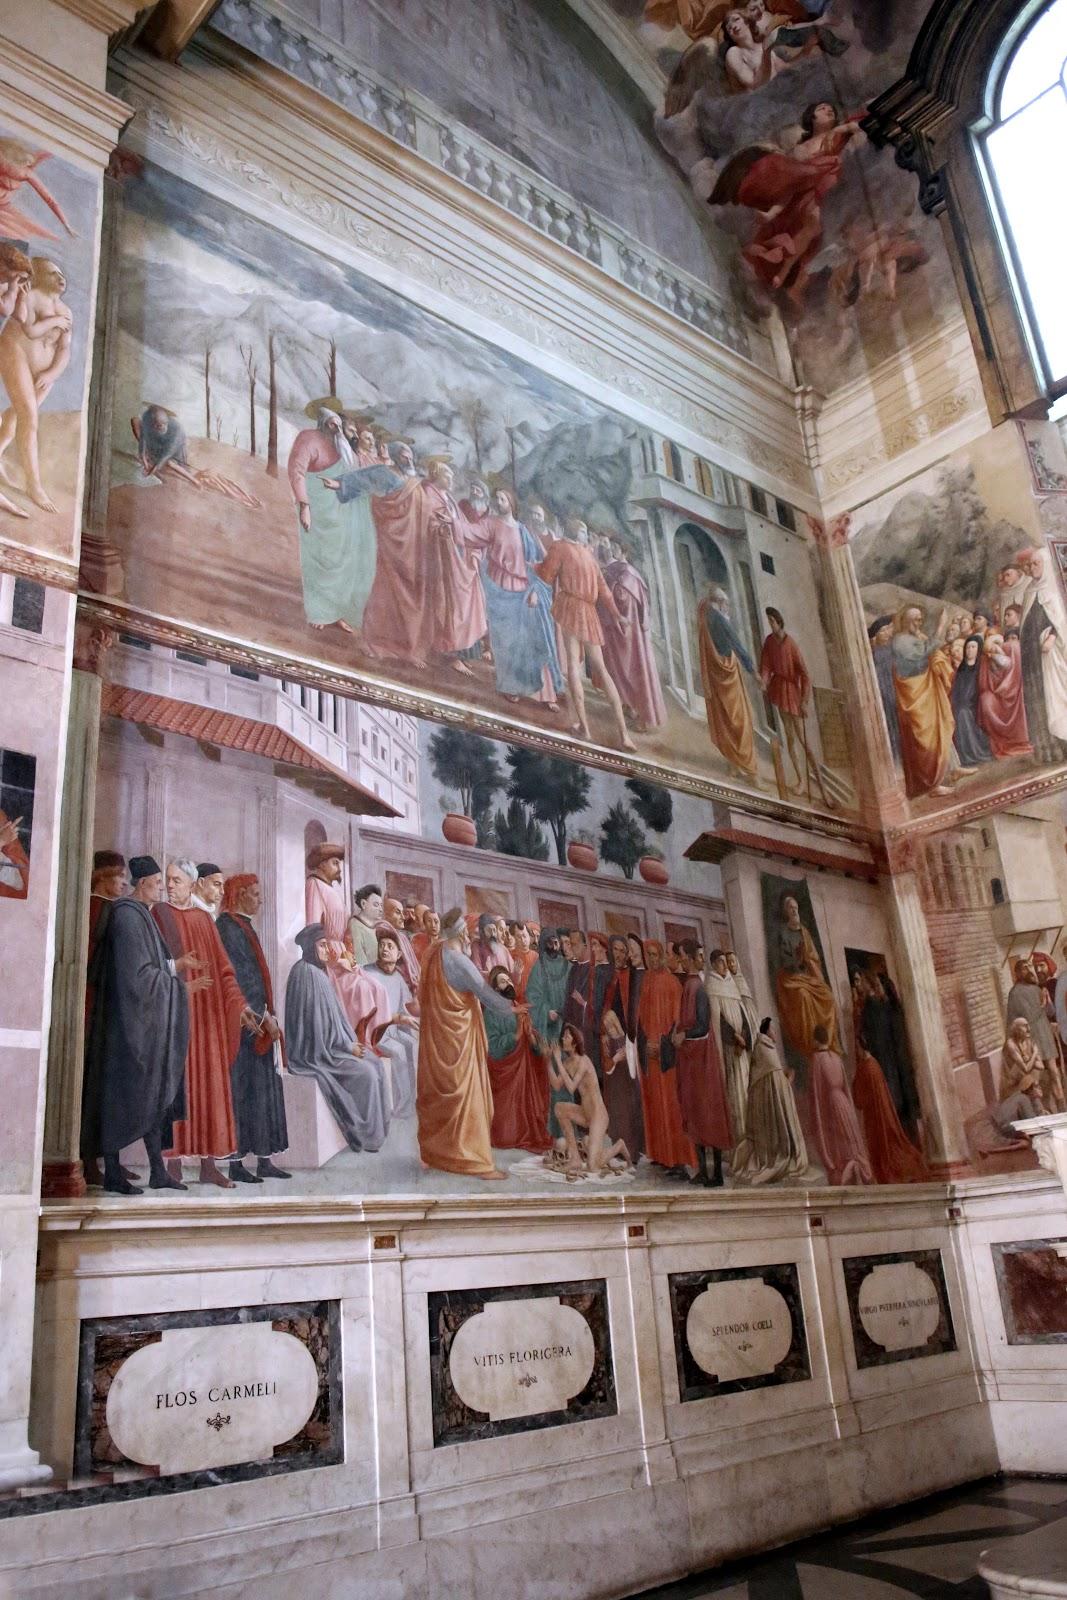 Il garzone della santa polenta directed by roby bianchi - 3 1